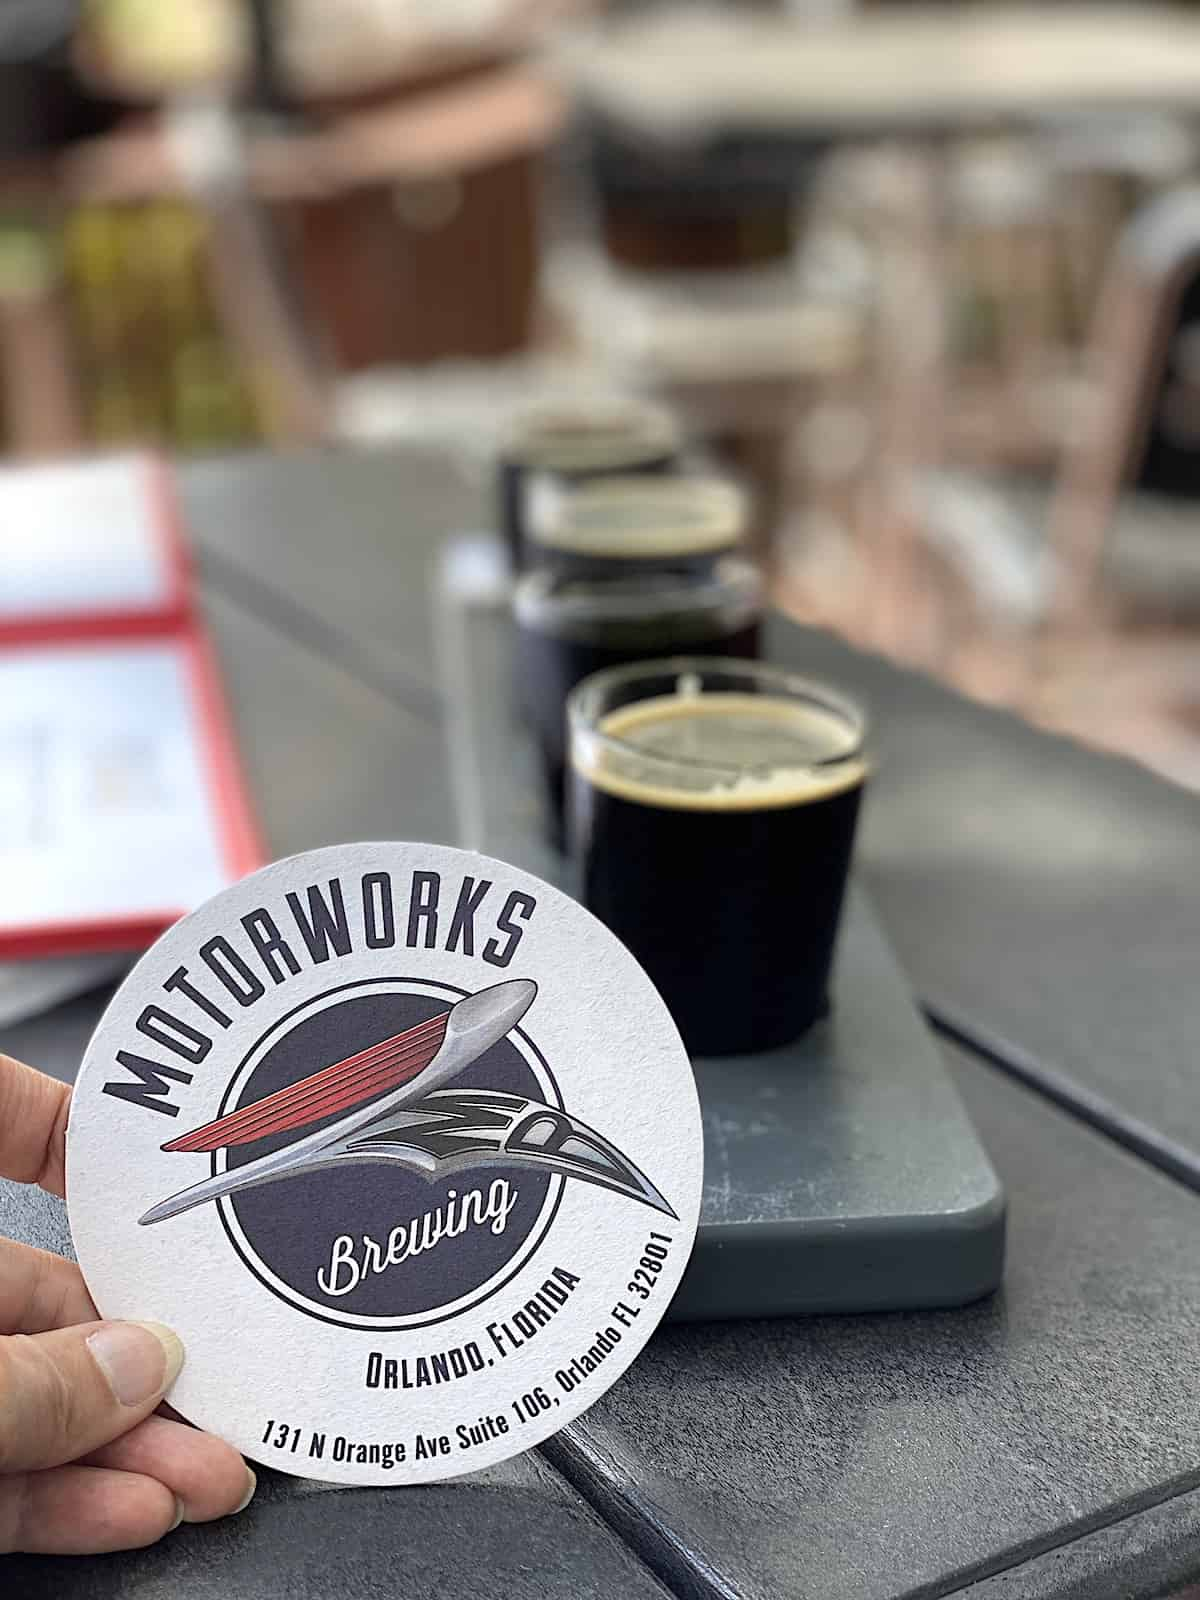 Motorworks coaster in front of a beer flight.